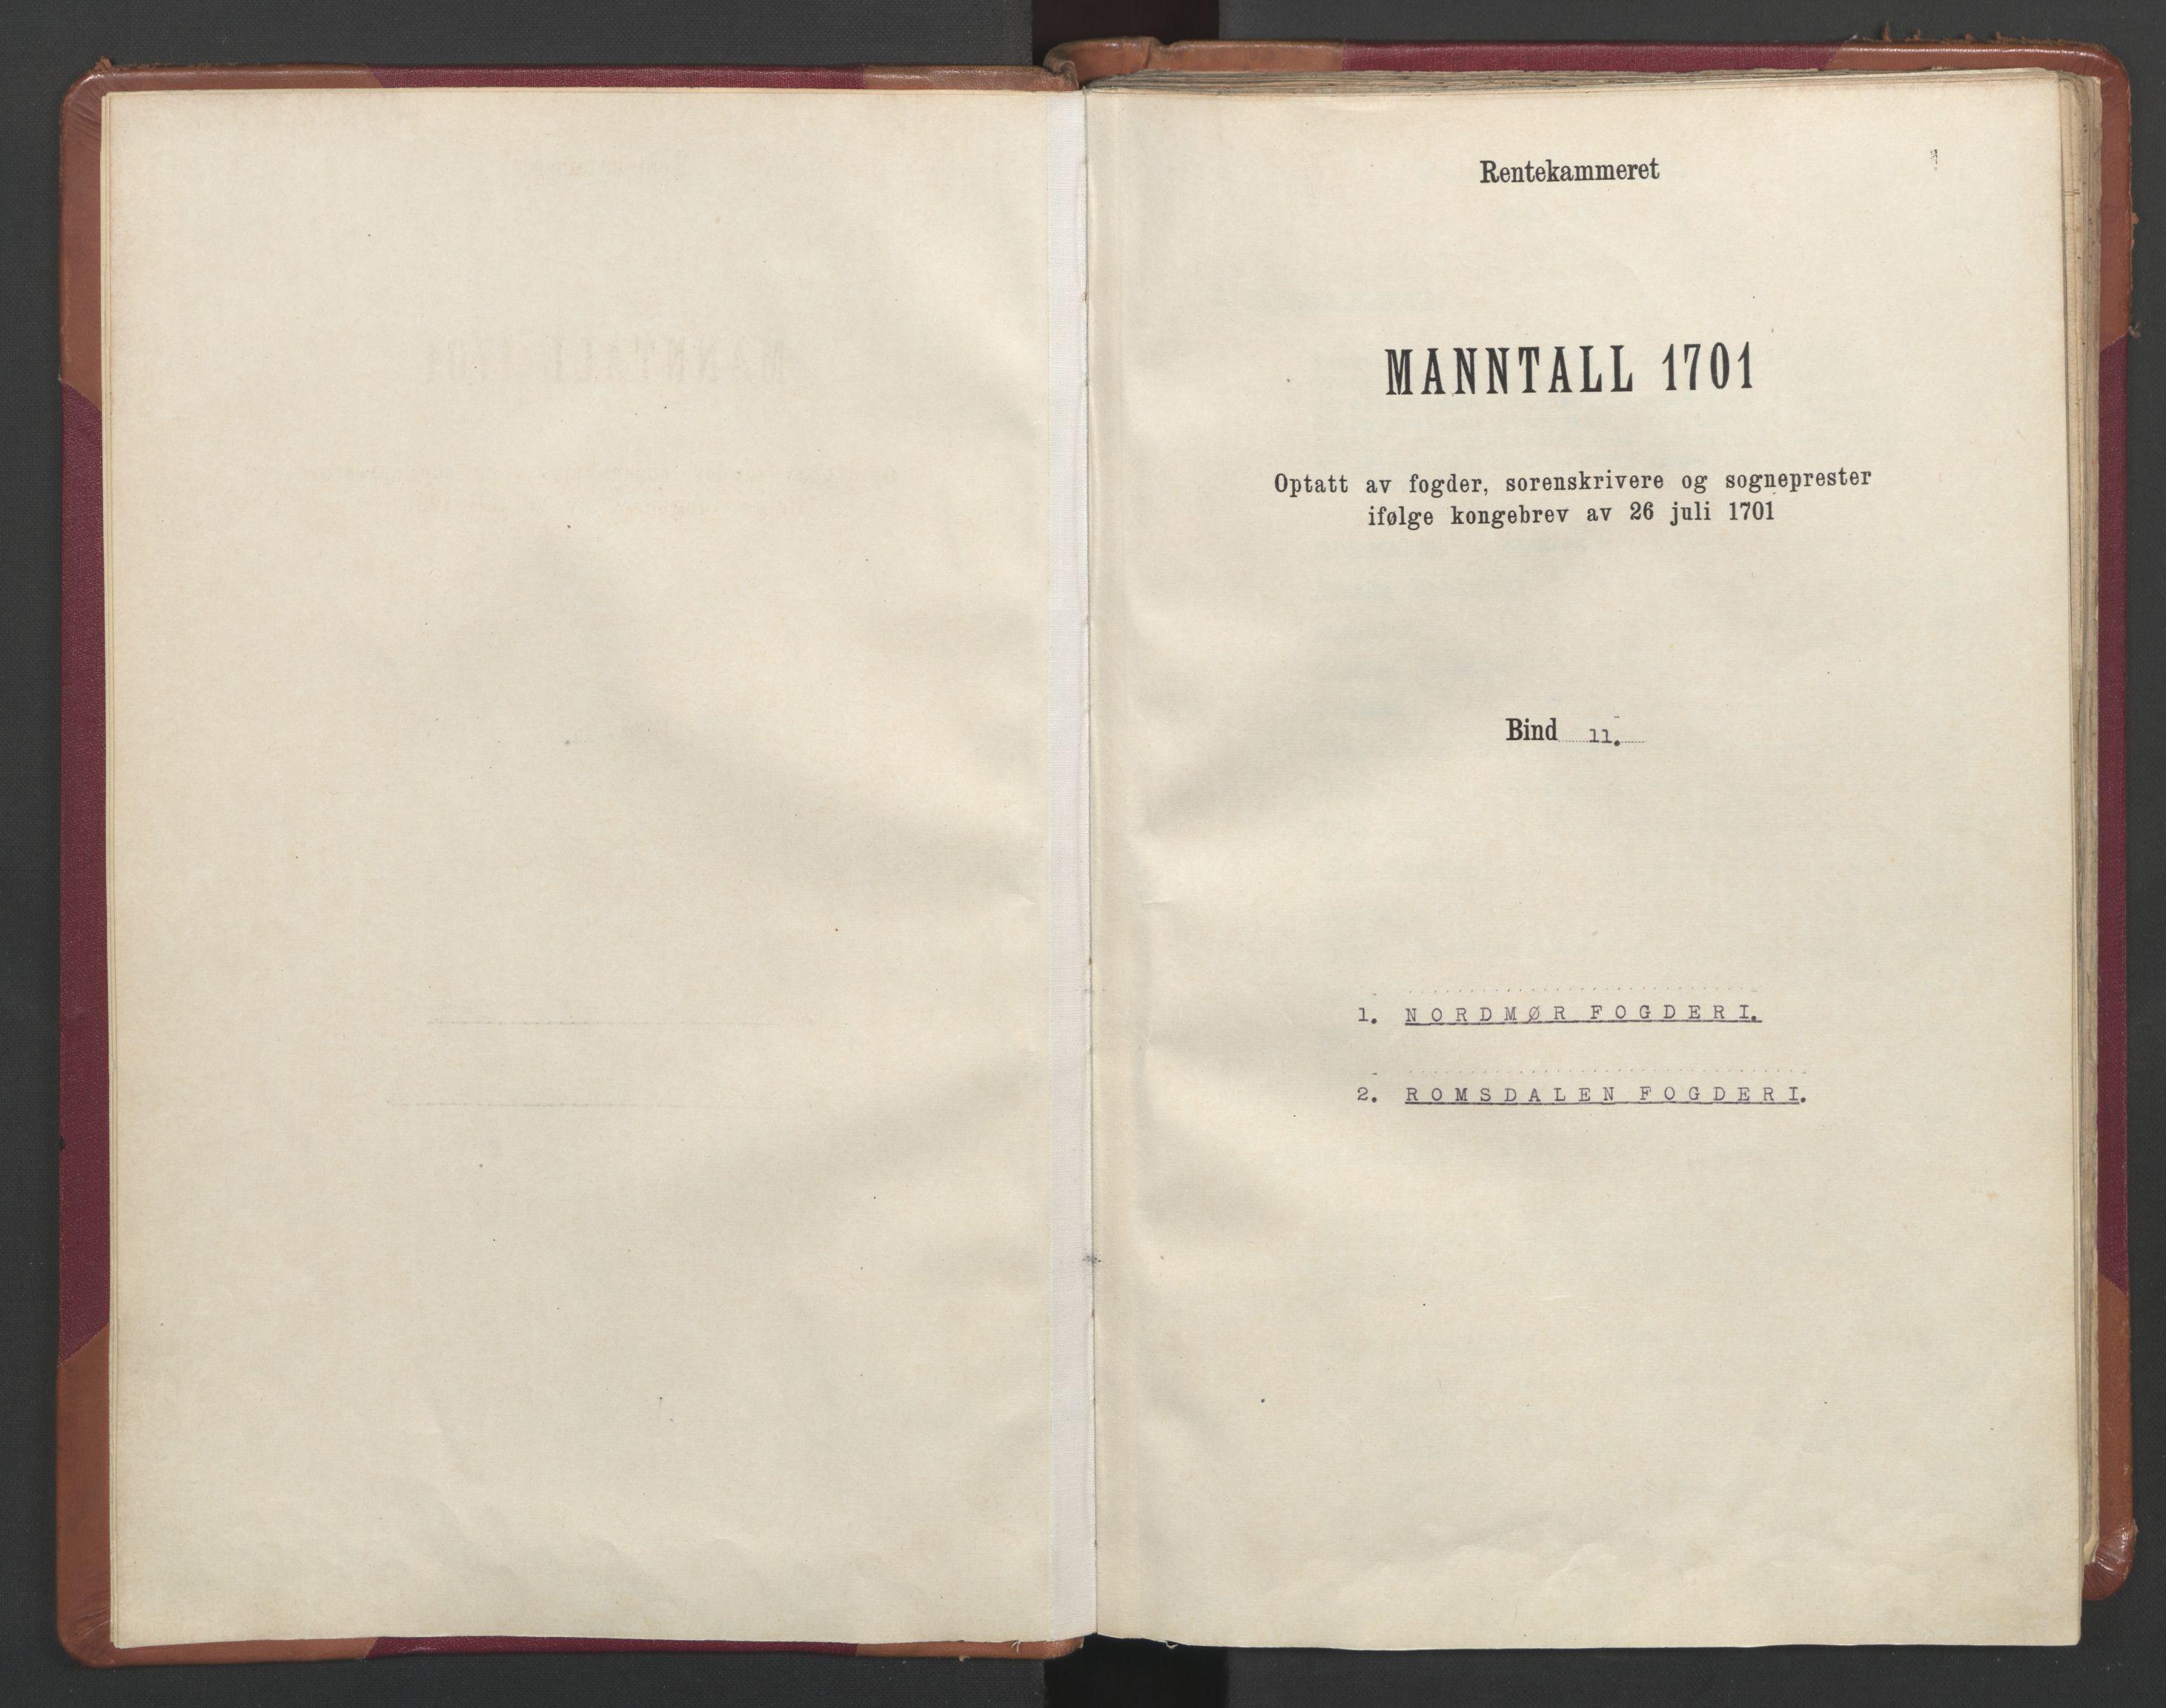 RA, Manntallet 1701, nr. 11: Nordmøre fogderi og Romsdal fogderi, 1701